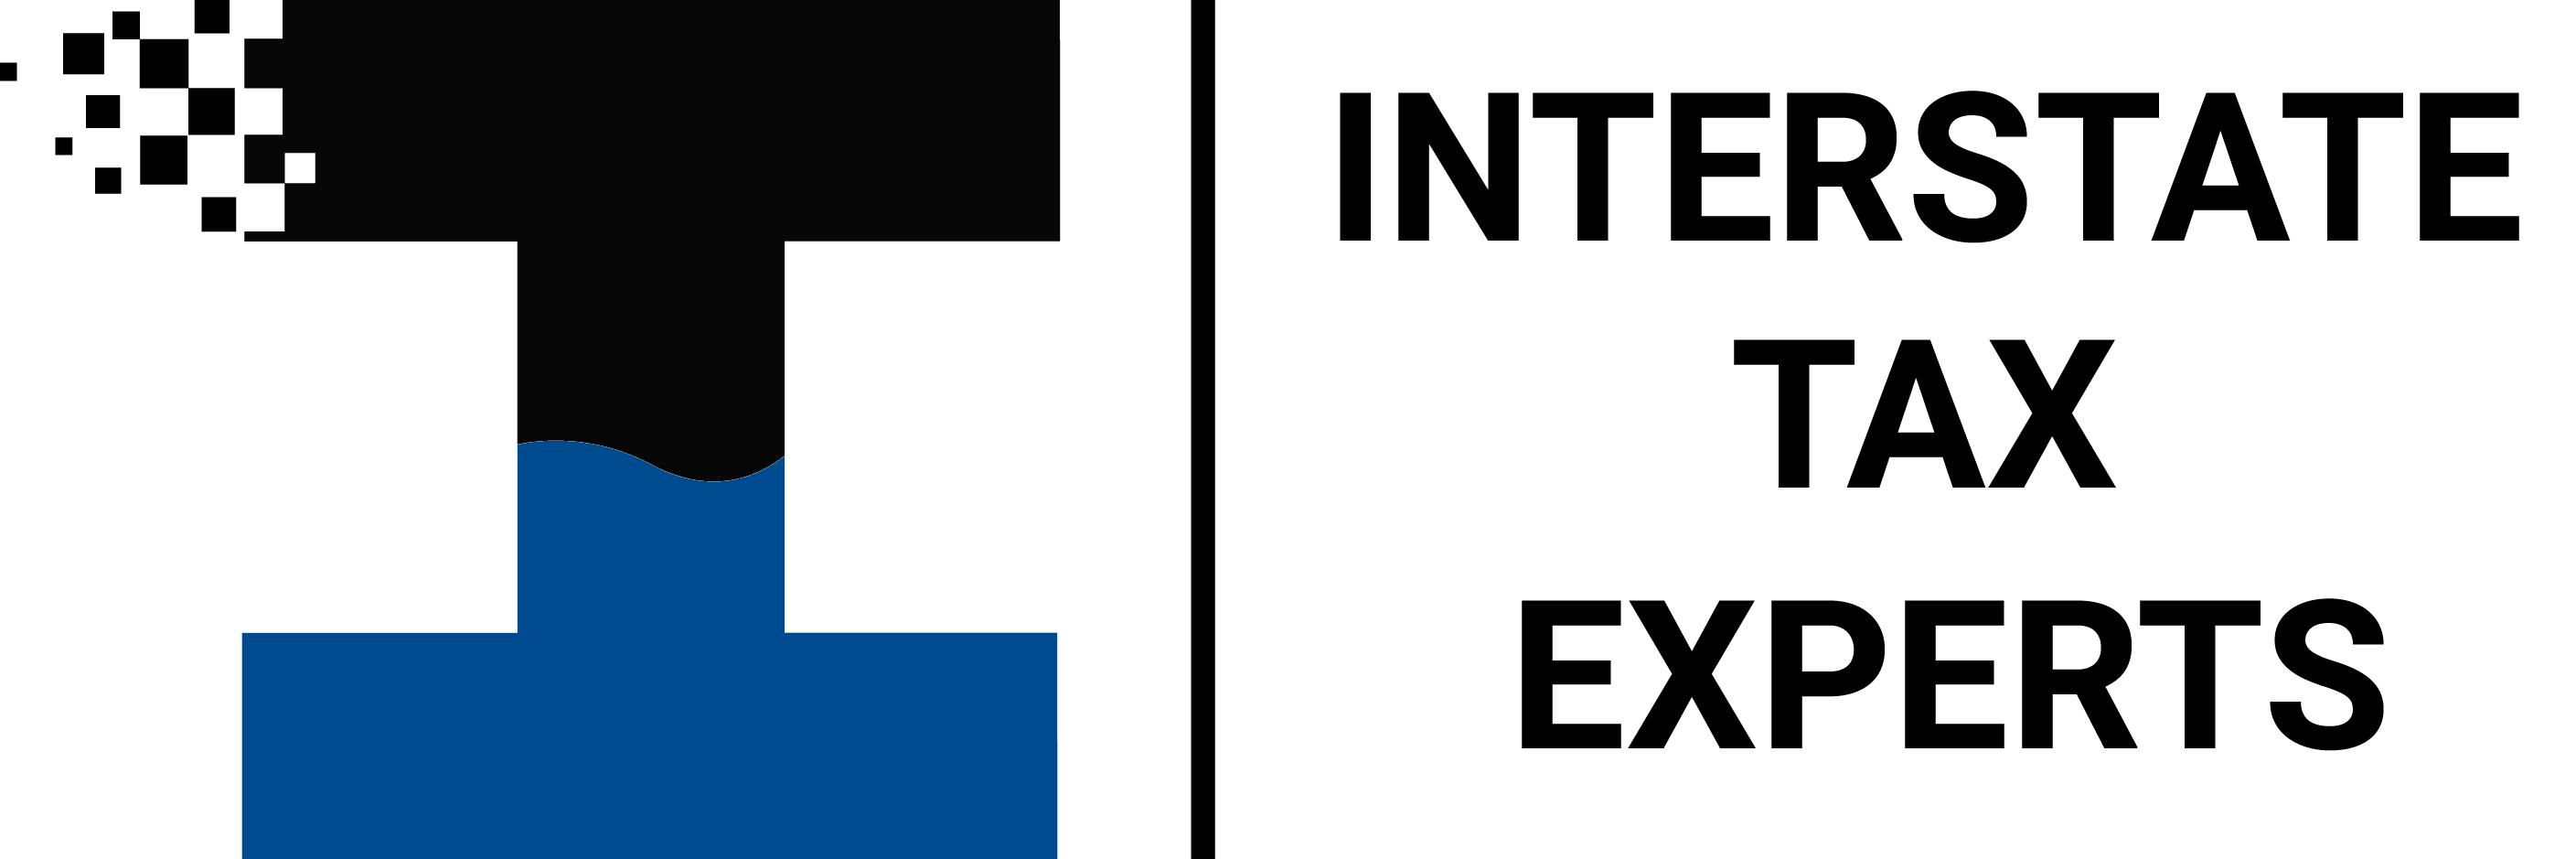 Interstate Tax Experts